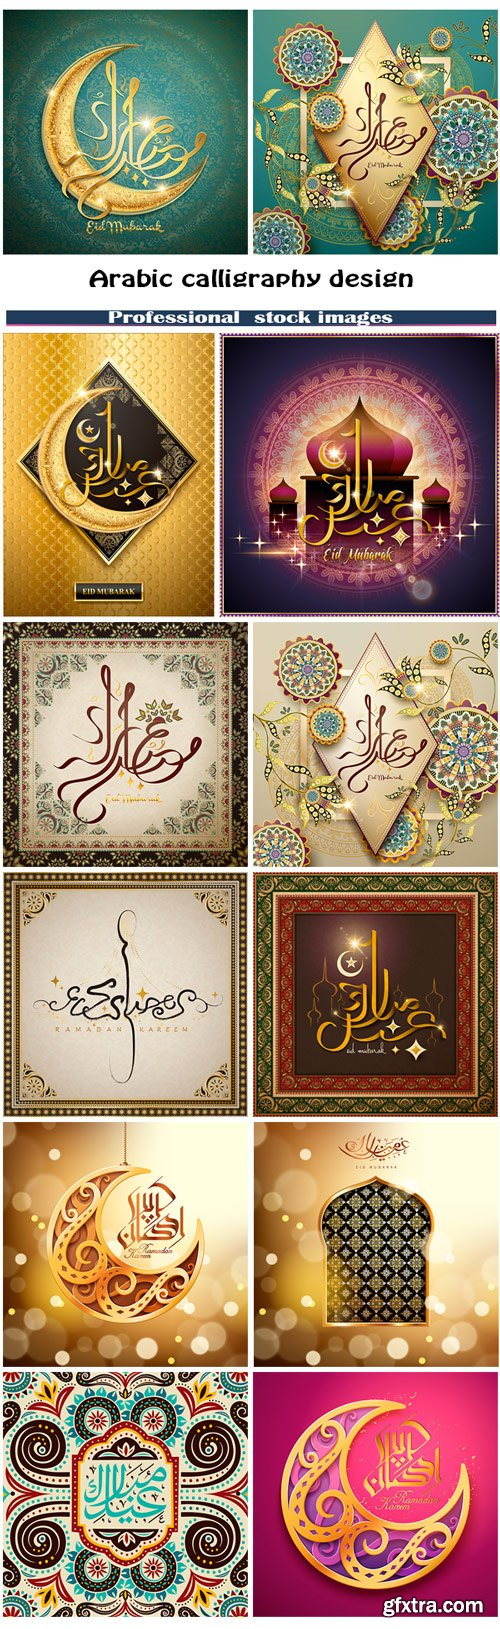 Arabic Calligraphy Design 12xEPS